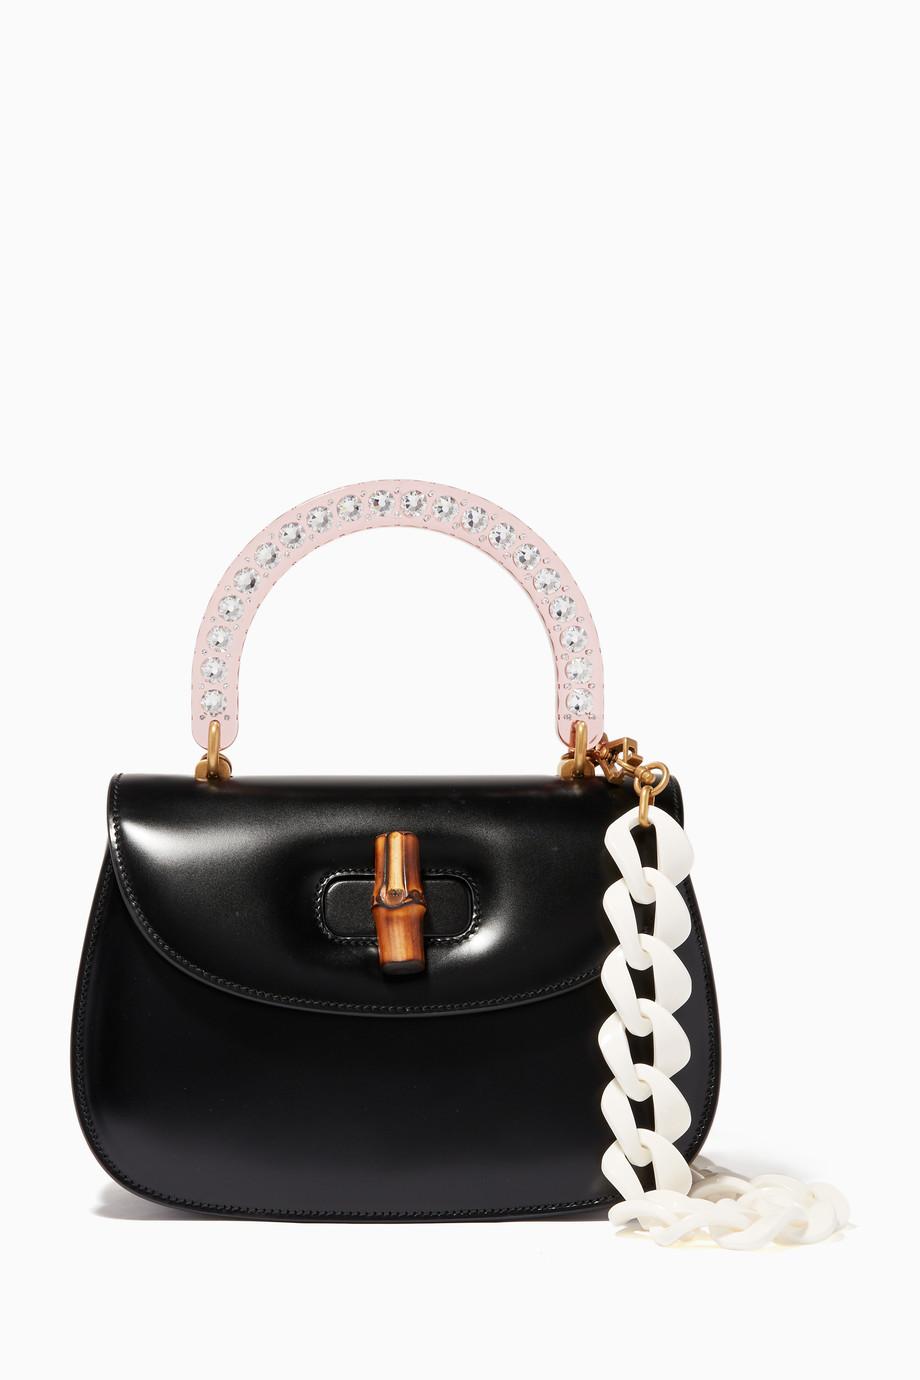 11d0543edf0d Shop Gucci Black Black Medium Bamboo Leather Top Handle Bag for ...